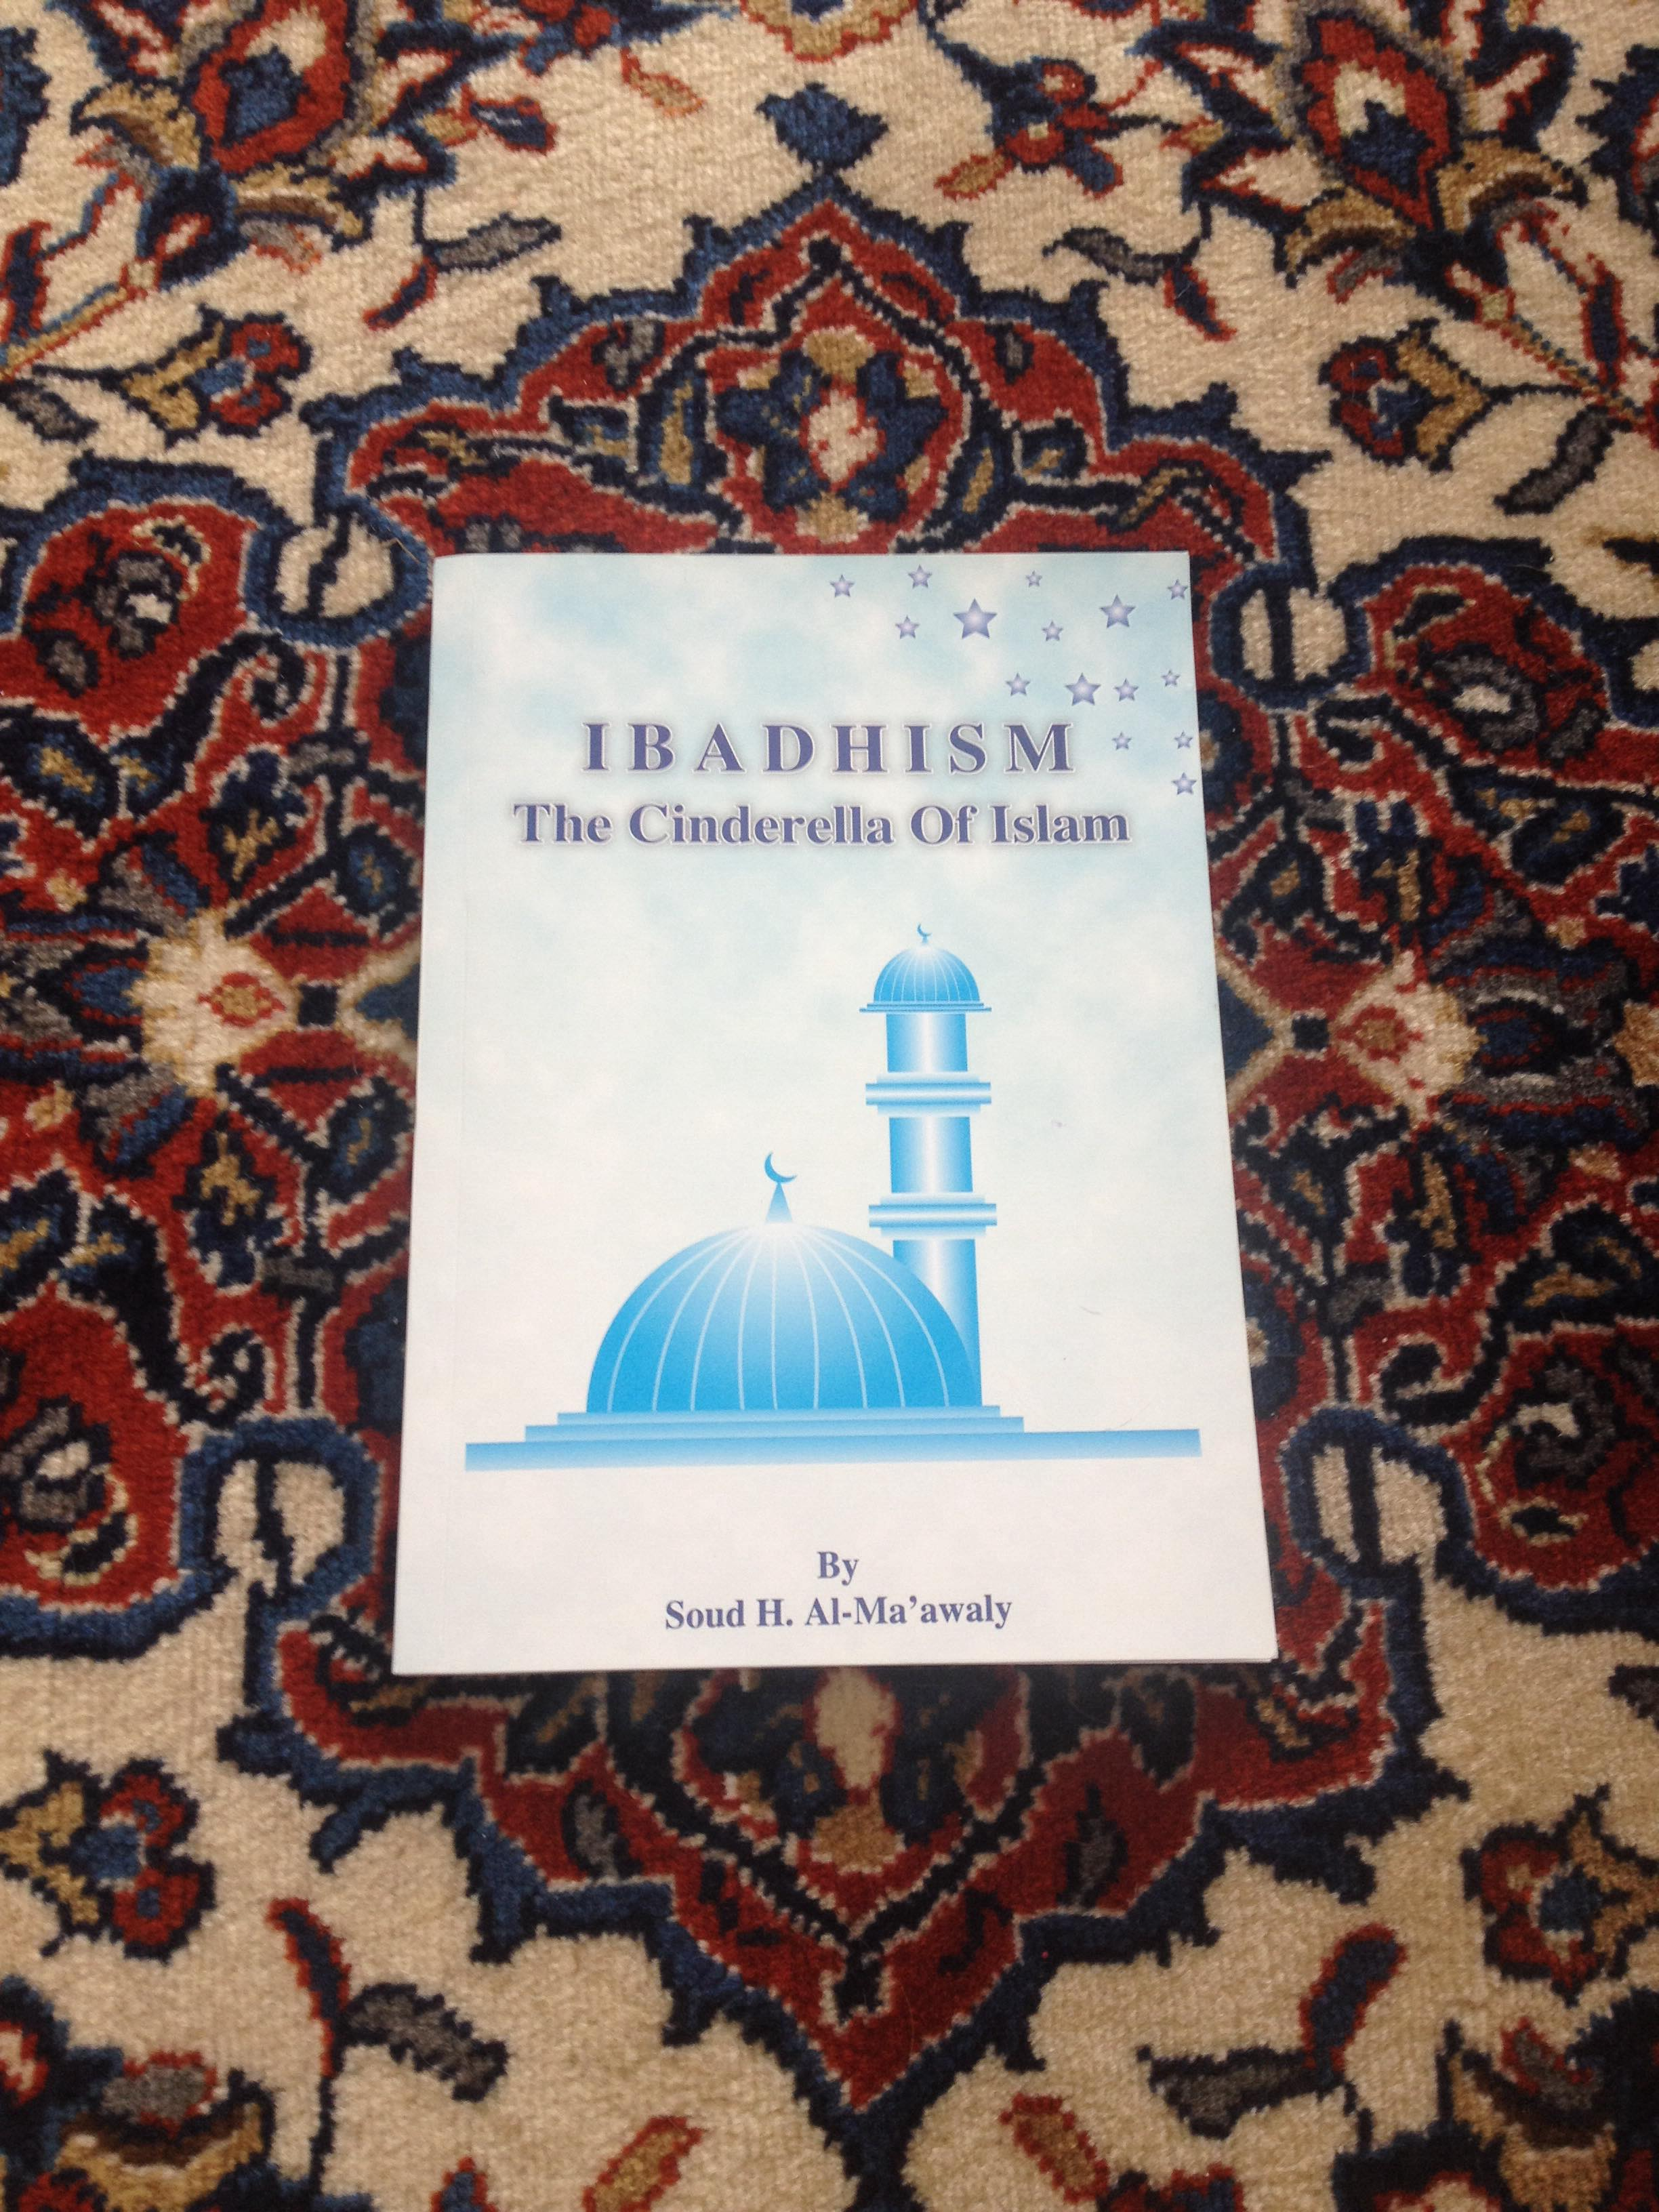 The Cinderella of Islam, er en populær bok om ibadisme i Oman. Foto: Kjersti S. Macdonald Aursnes